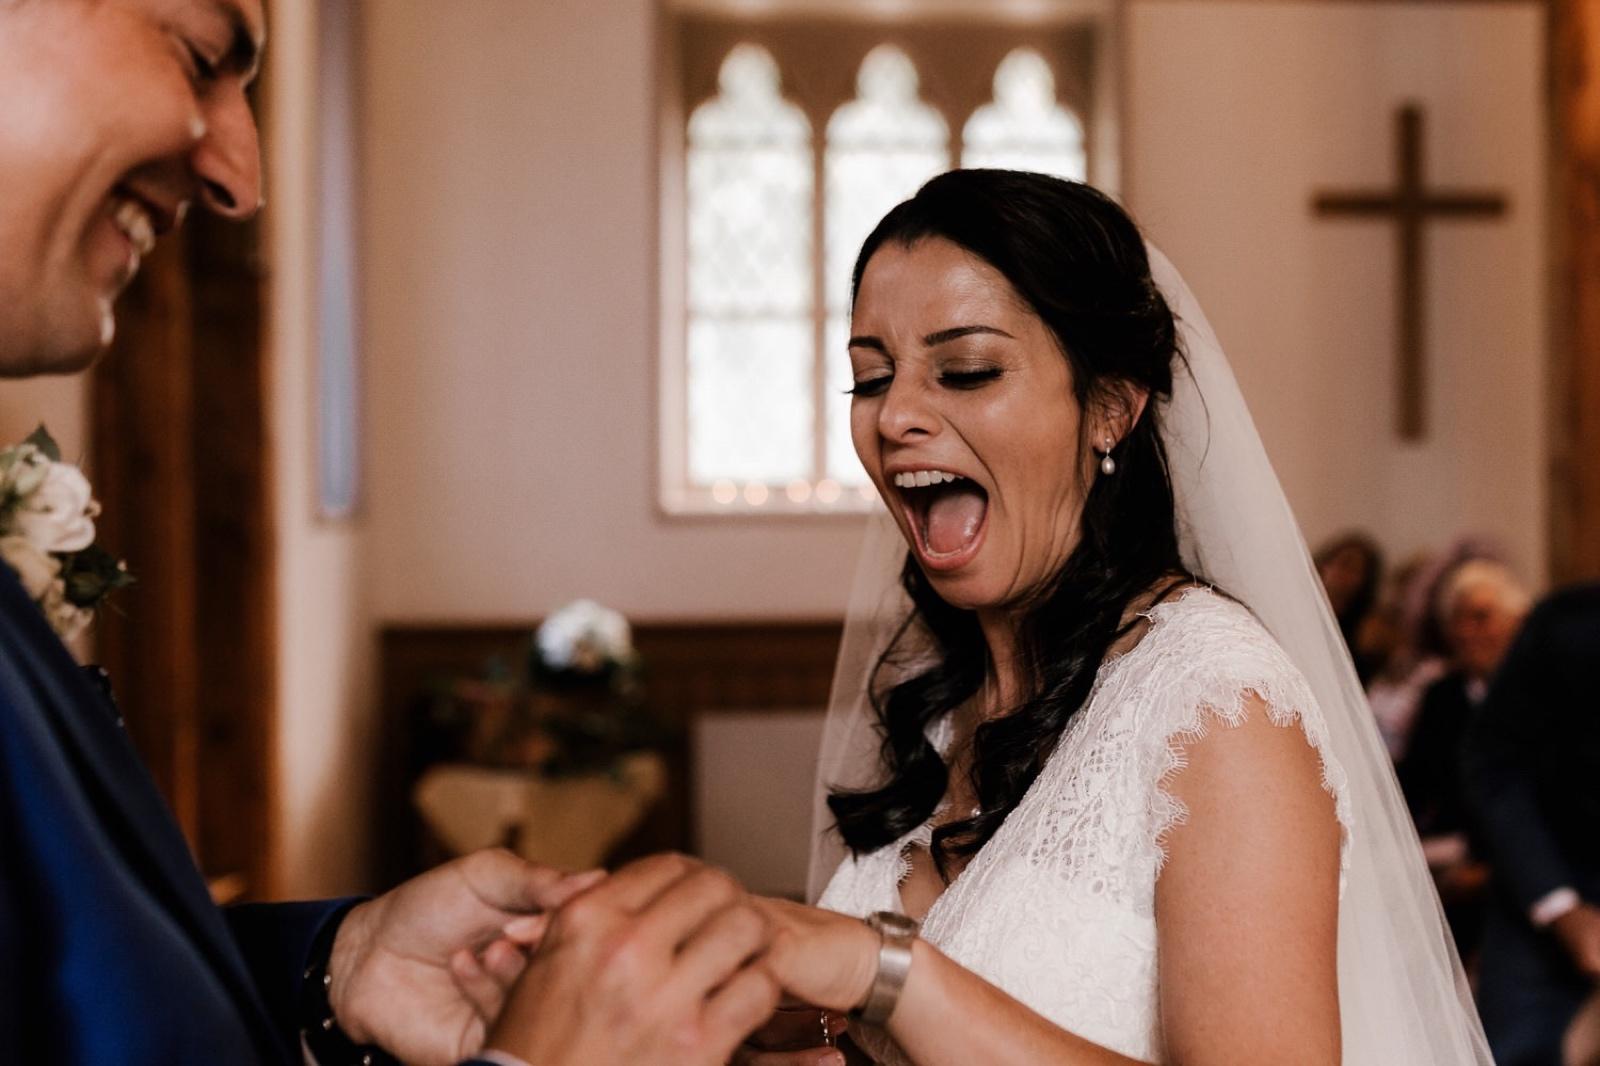 Fotomagoria Best 0f 2018 Wedding Photographer Italy22.jpg